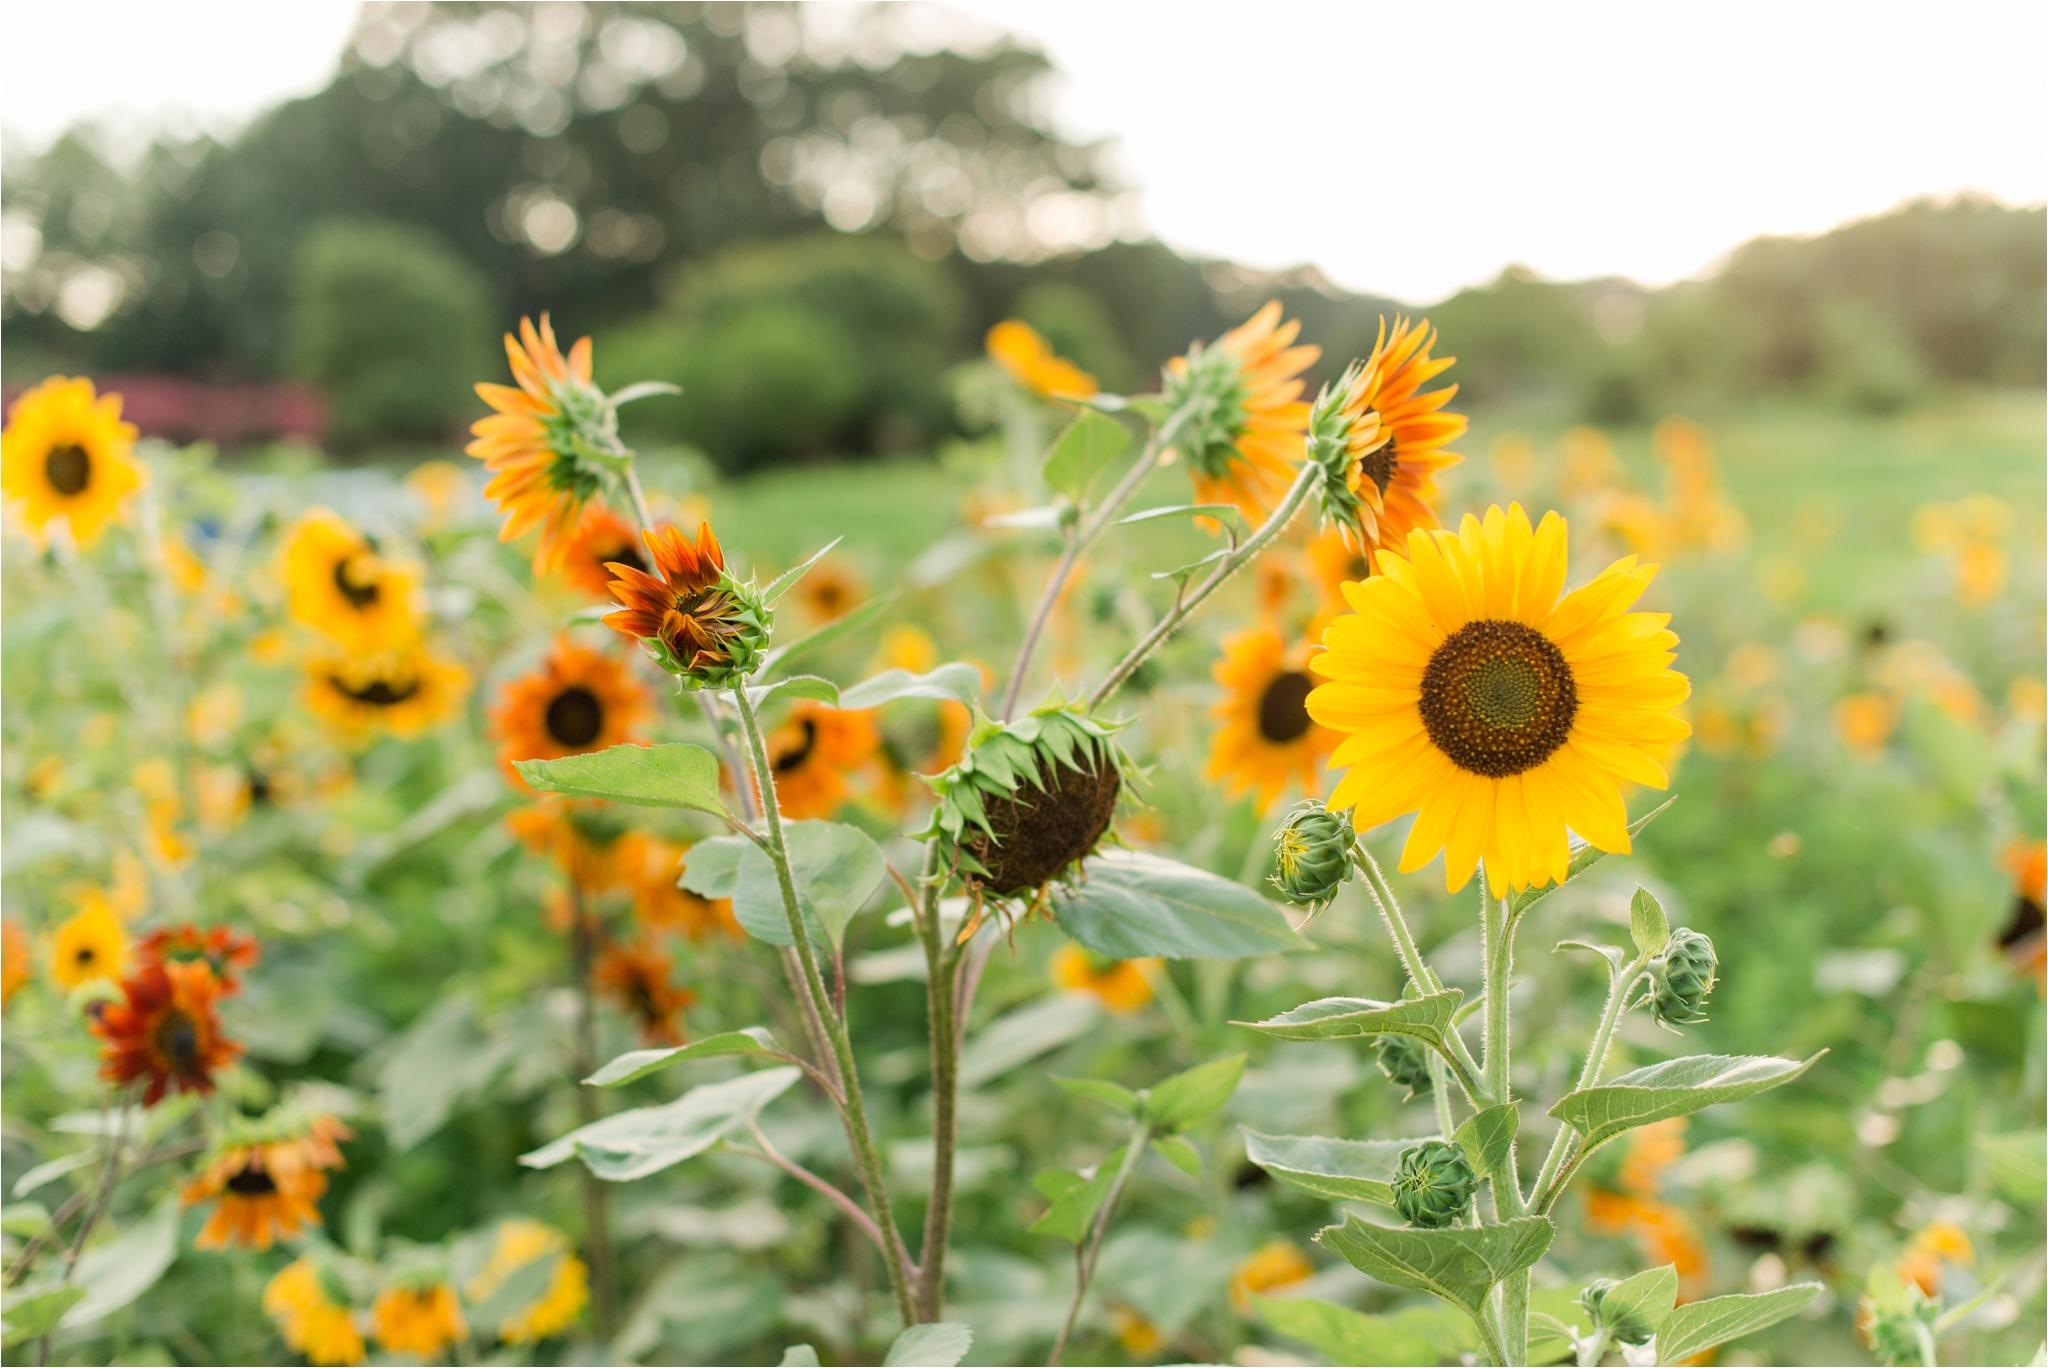 dorthea_dix_park_sunflower_field_raleigh_nc_jaclyn_auletta_photography_0003.jpg